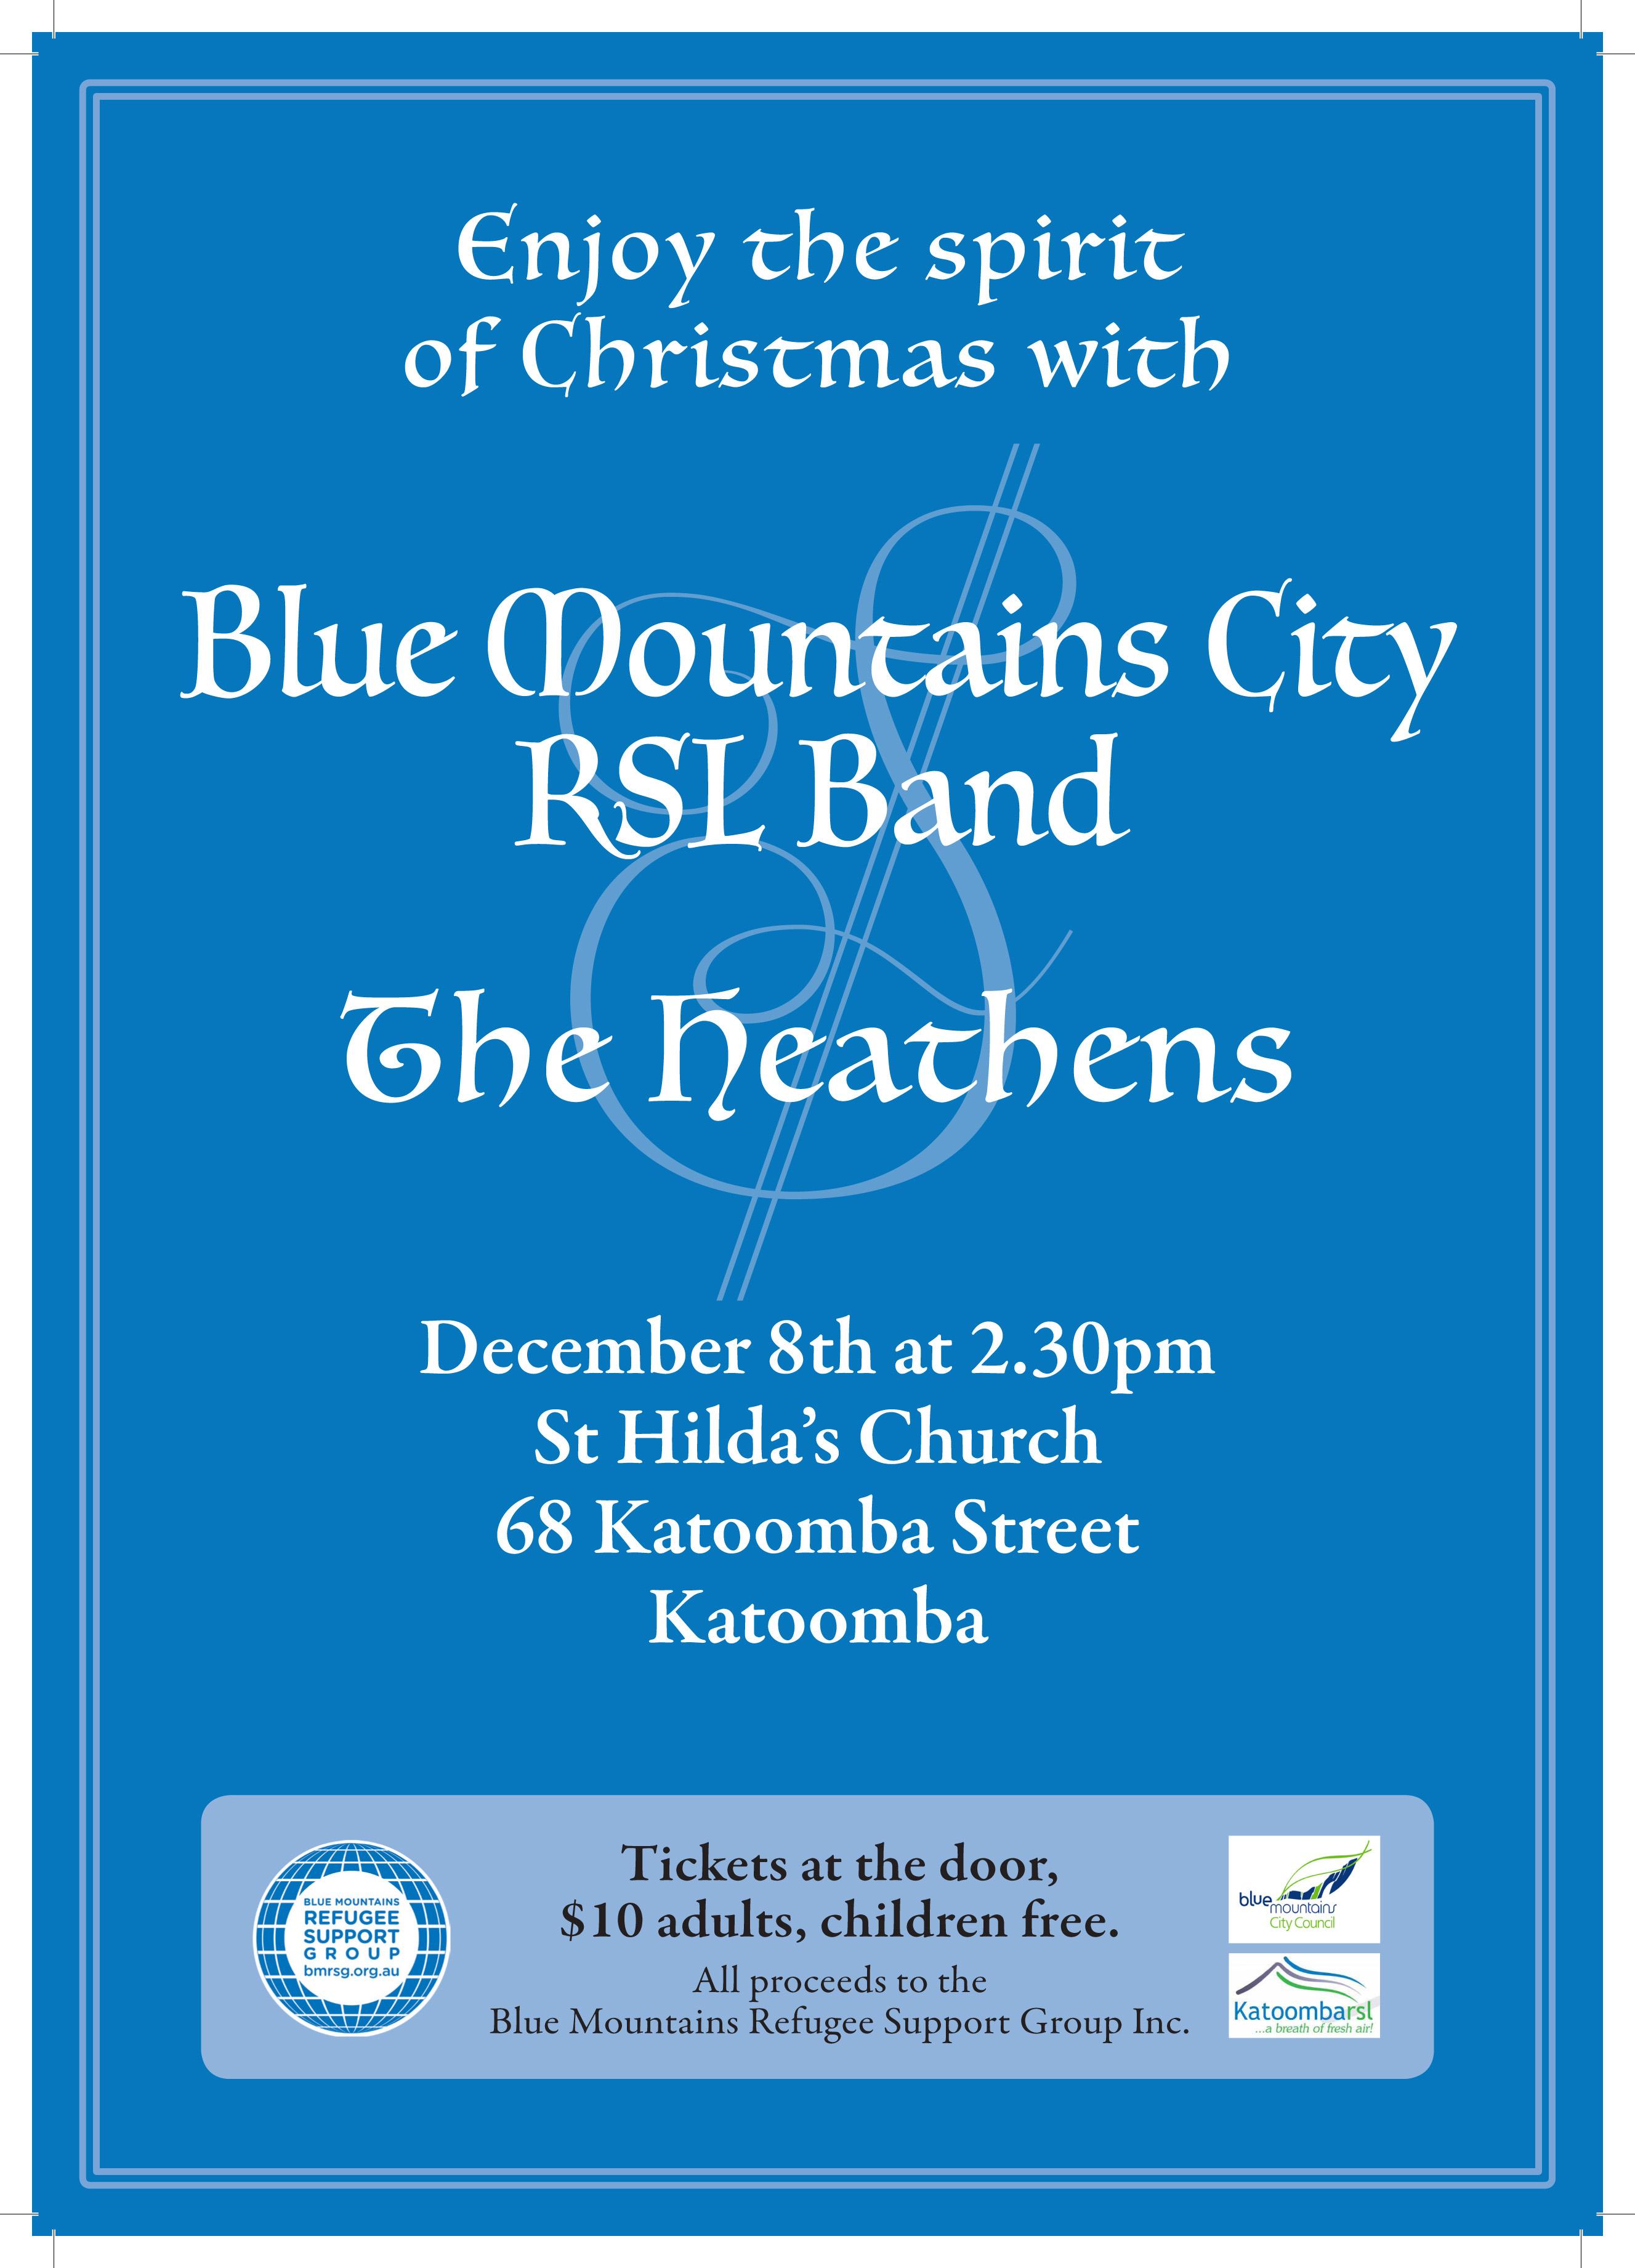 BMRSG christmas concert poster(V3)